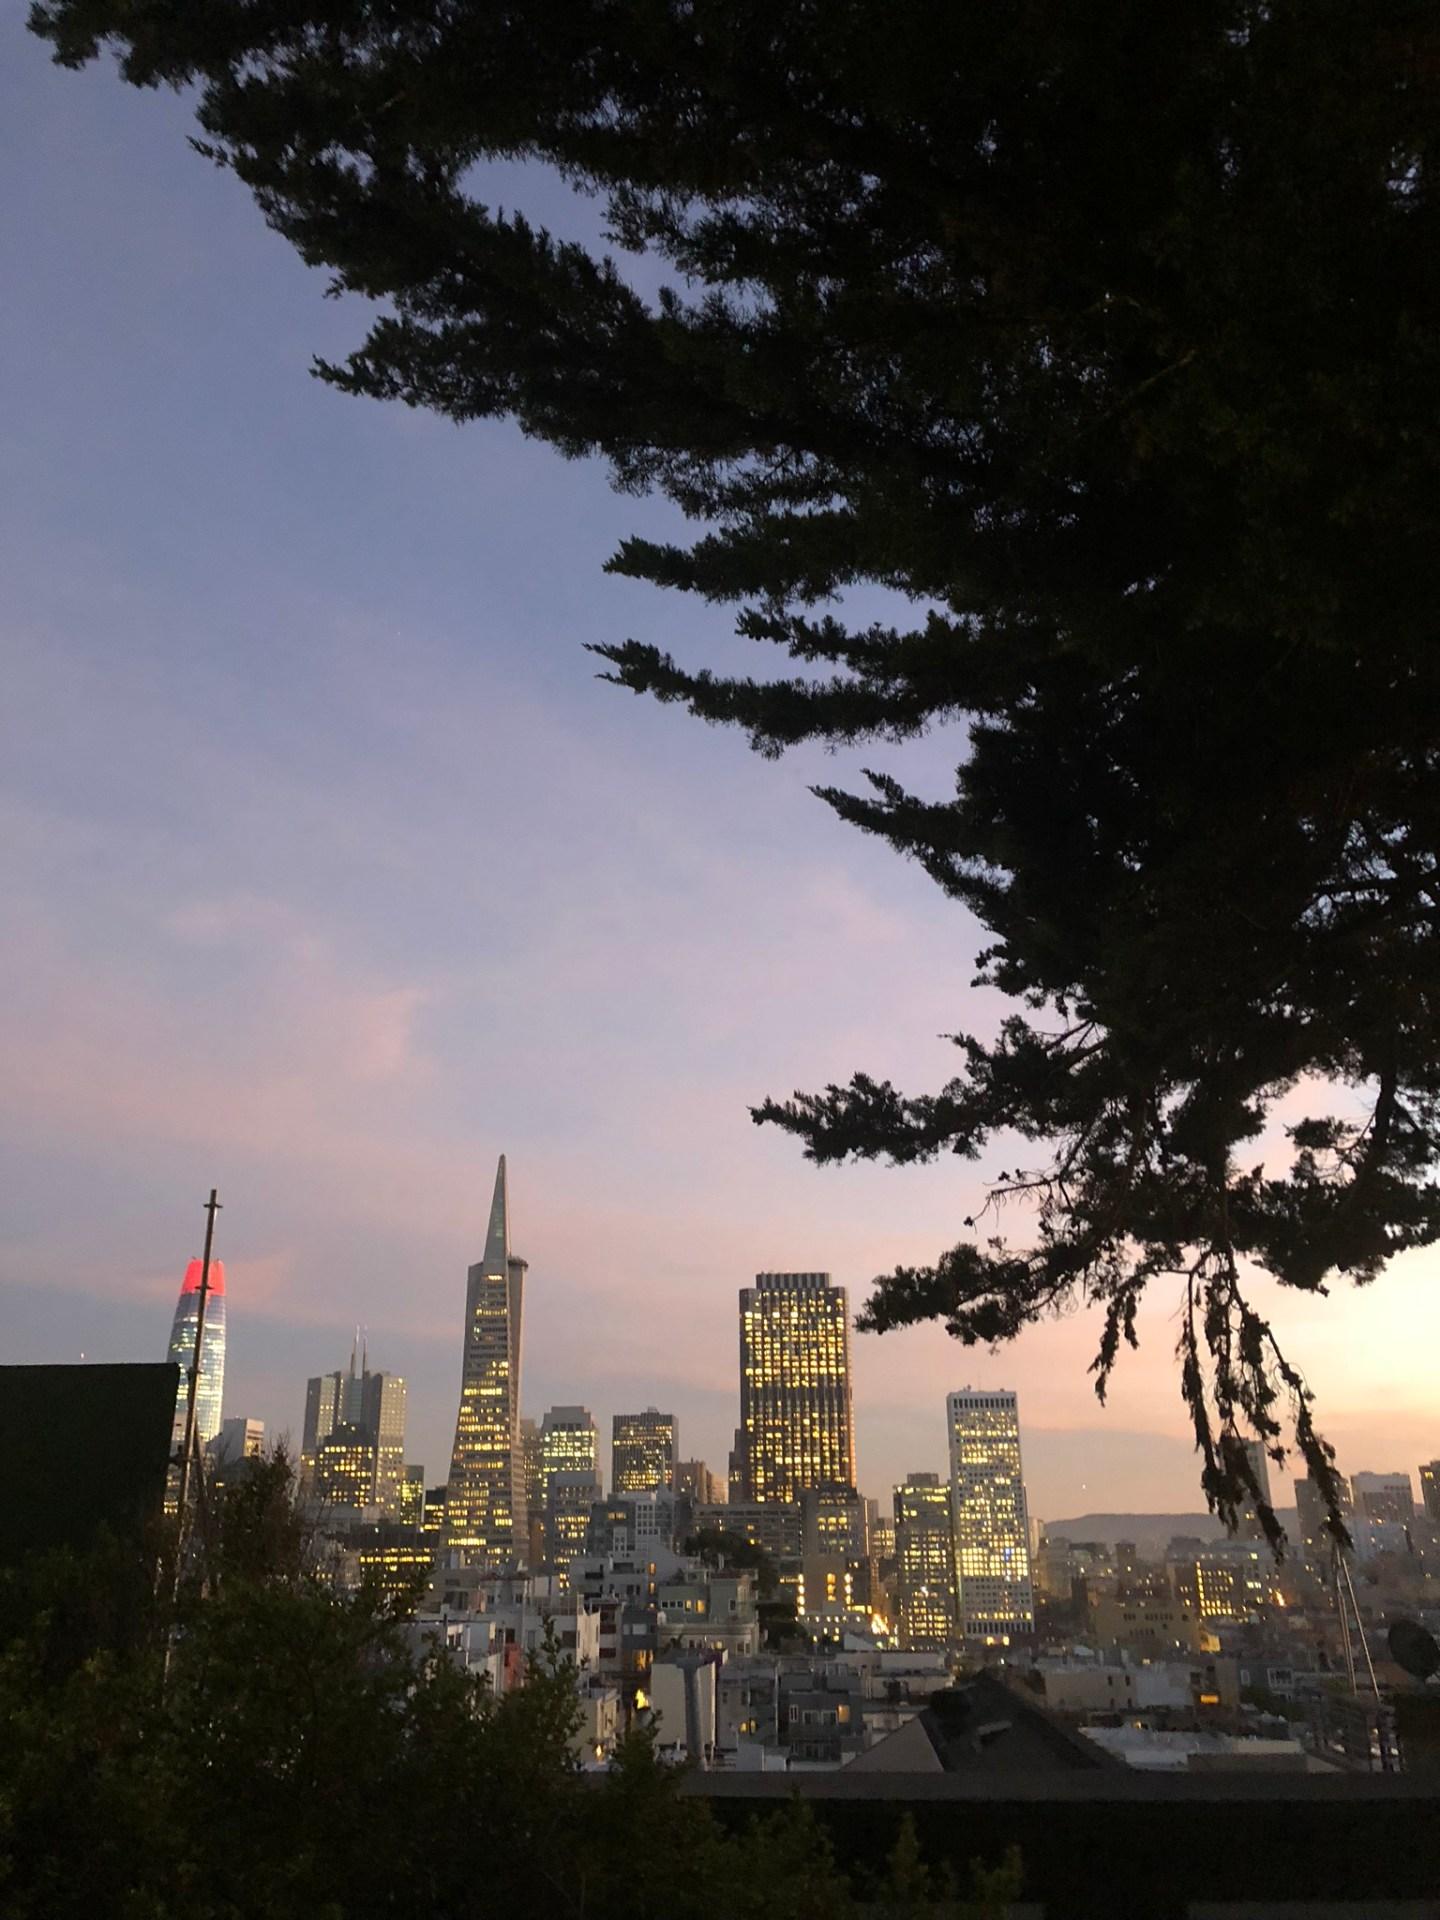 Sunset over the San Francisco skyline